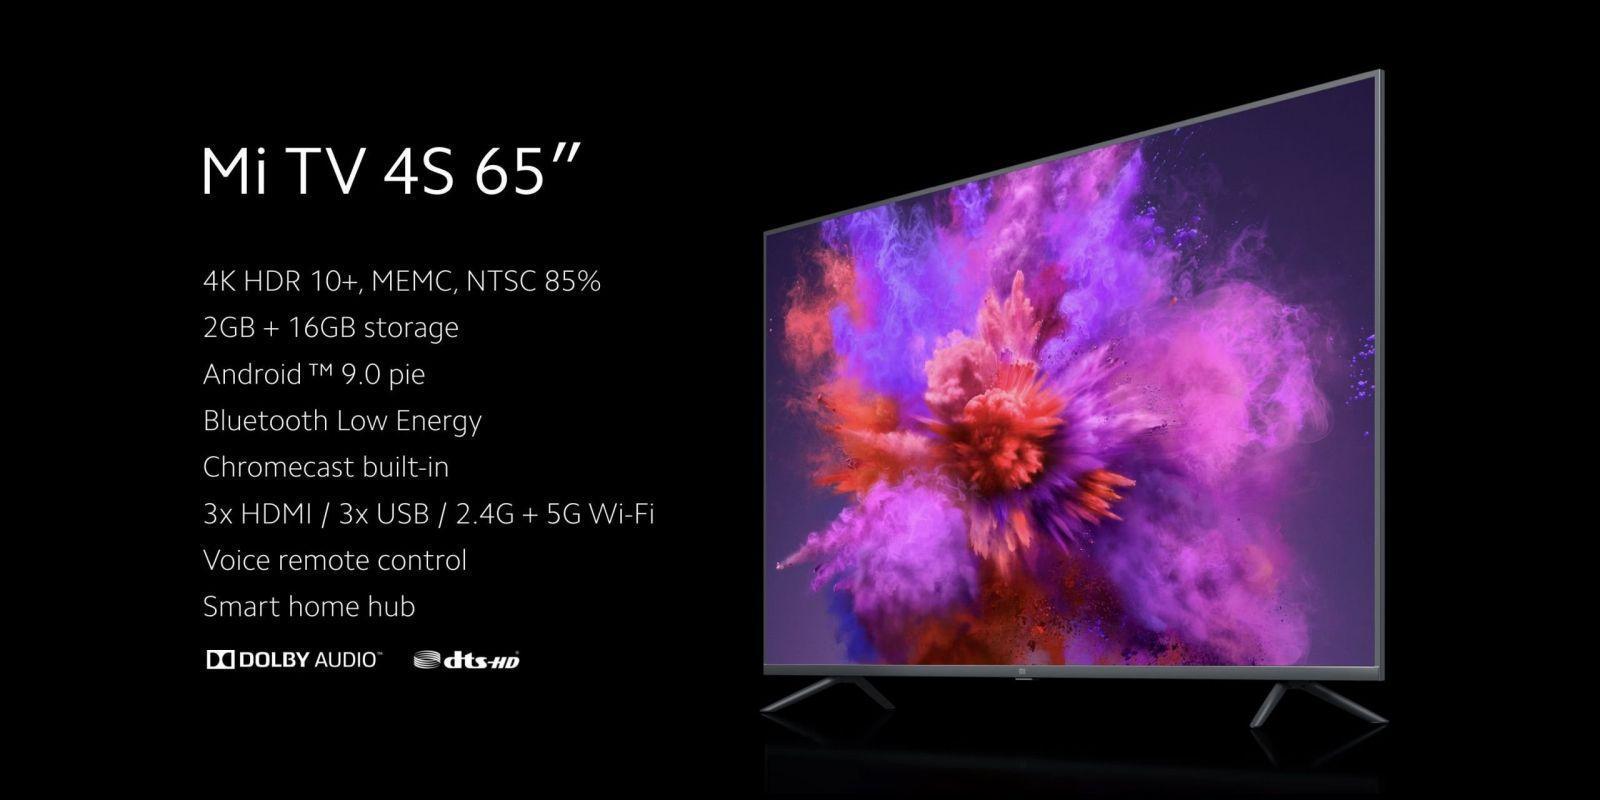 Xiaomi представила 65-дюймовый телевизор Mi TV 4S Xiaomi представила 65-дюймовый телевизор Mi TV 4S